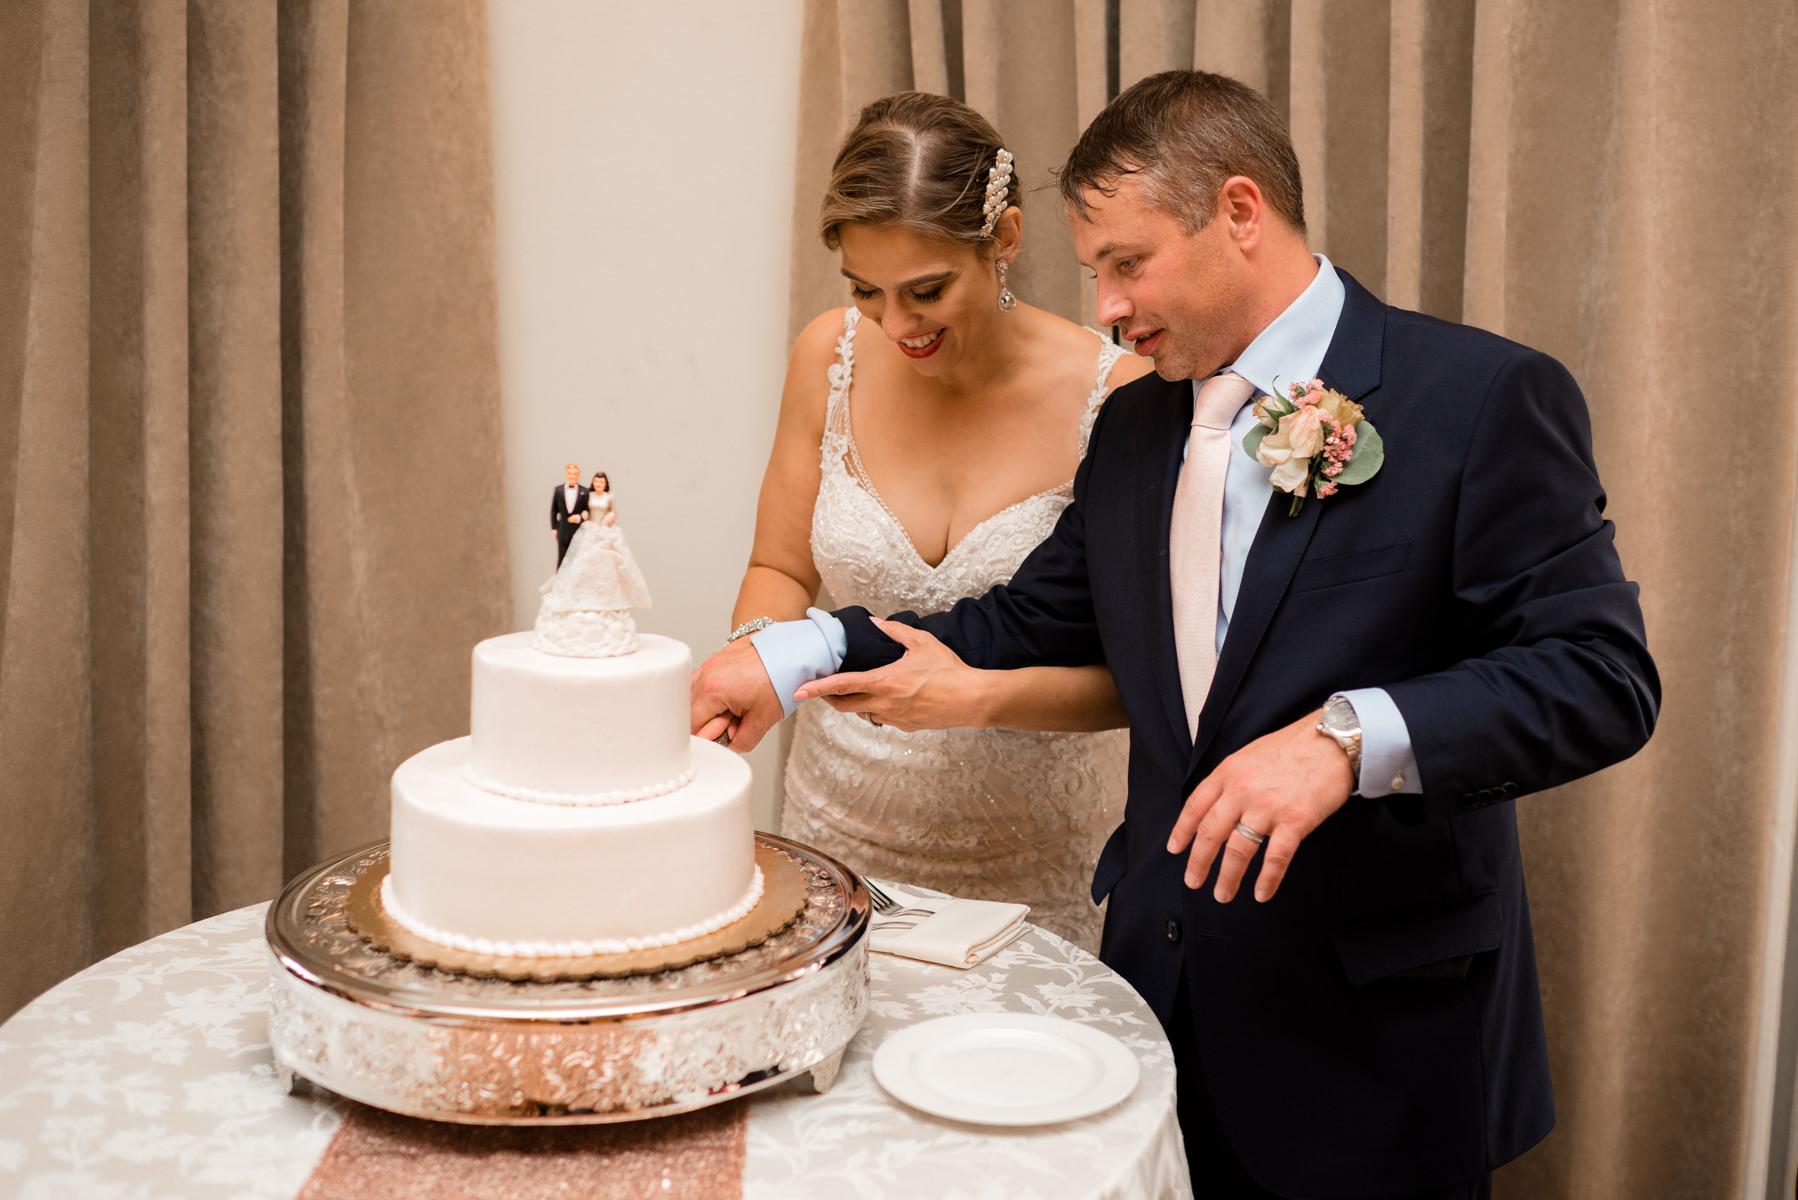 Andrew Tat - Documentary Wedding Photography - Hotel Sorrento - Seattle, Washington -Jessica & Paul - 34.jpg